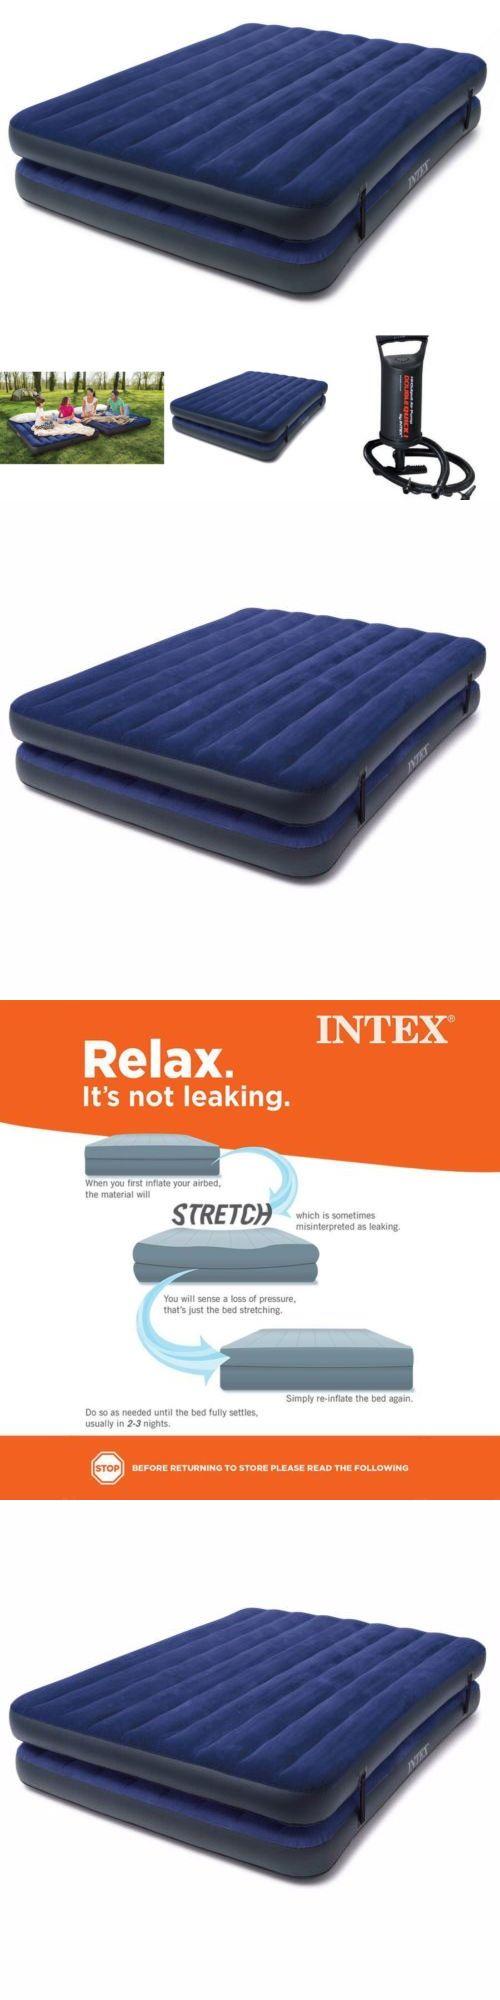 Best 10+ Camping air mattress ideas on Pinterest | Car tent, Portable  mattress and Portable bed